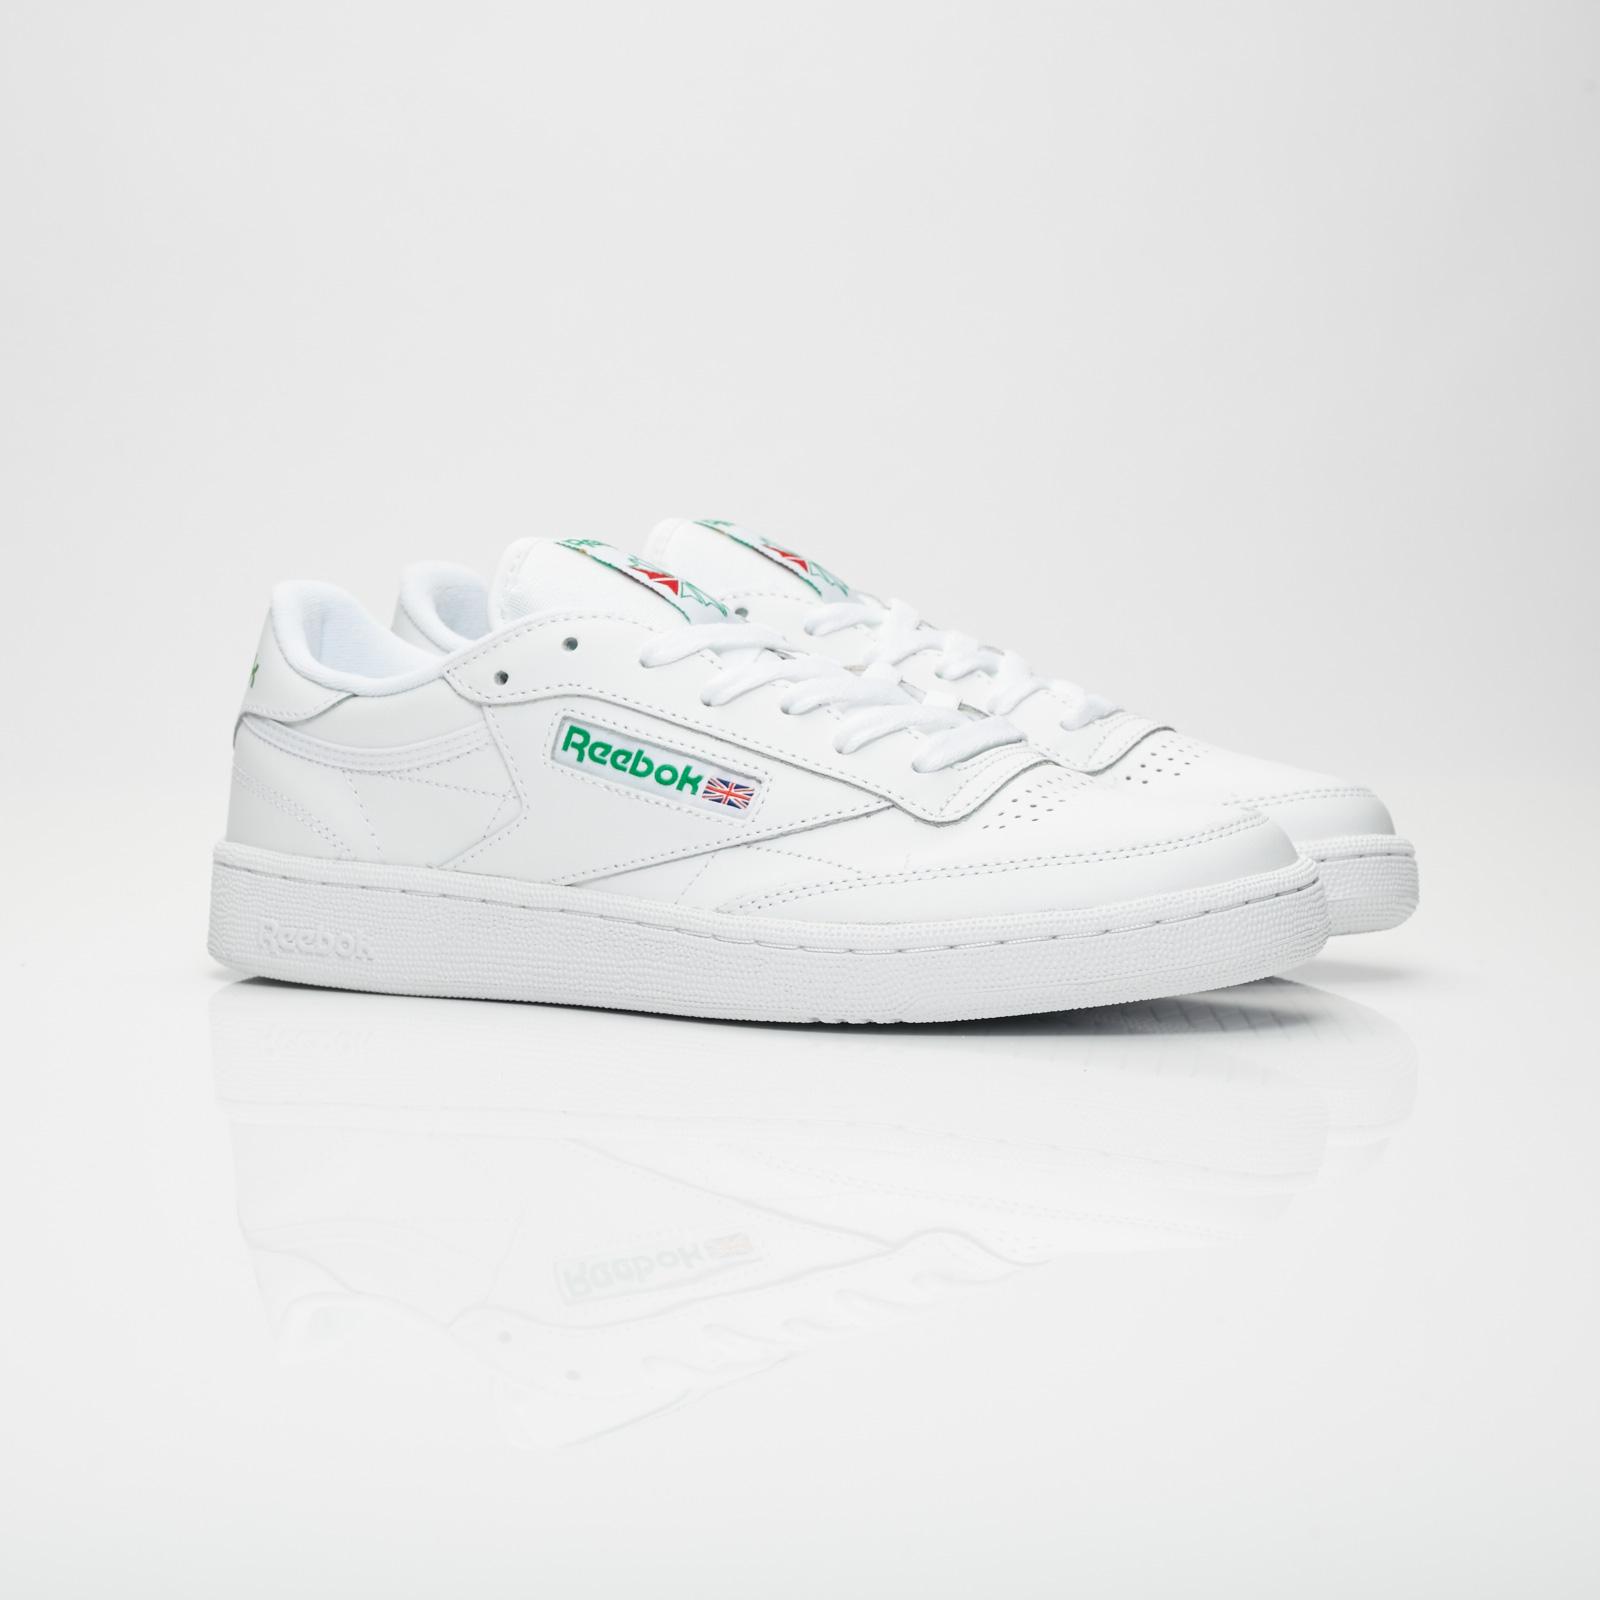 1097c0071b4 Reebok Club C 85 - Ar0456 - Sneakersnstuff